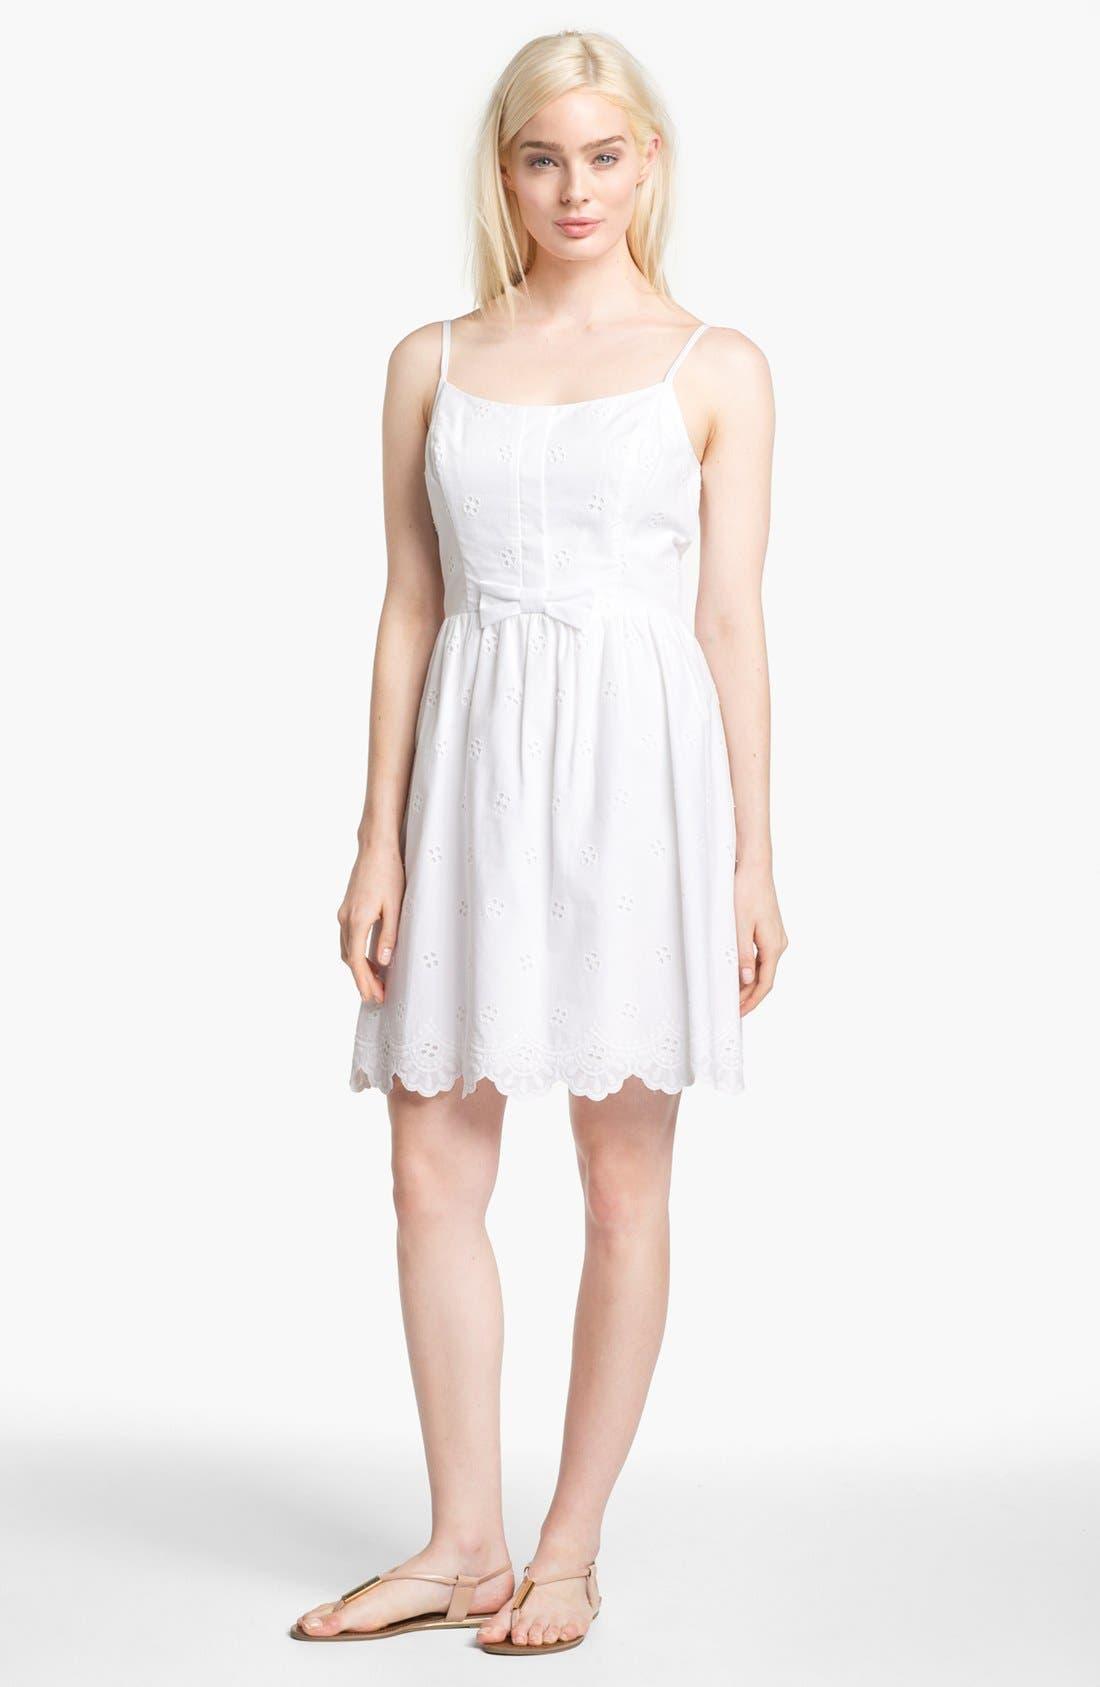 Main Image - Lilly Pulitzer® 'Antonia' Cotton Eyelet Dress